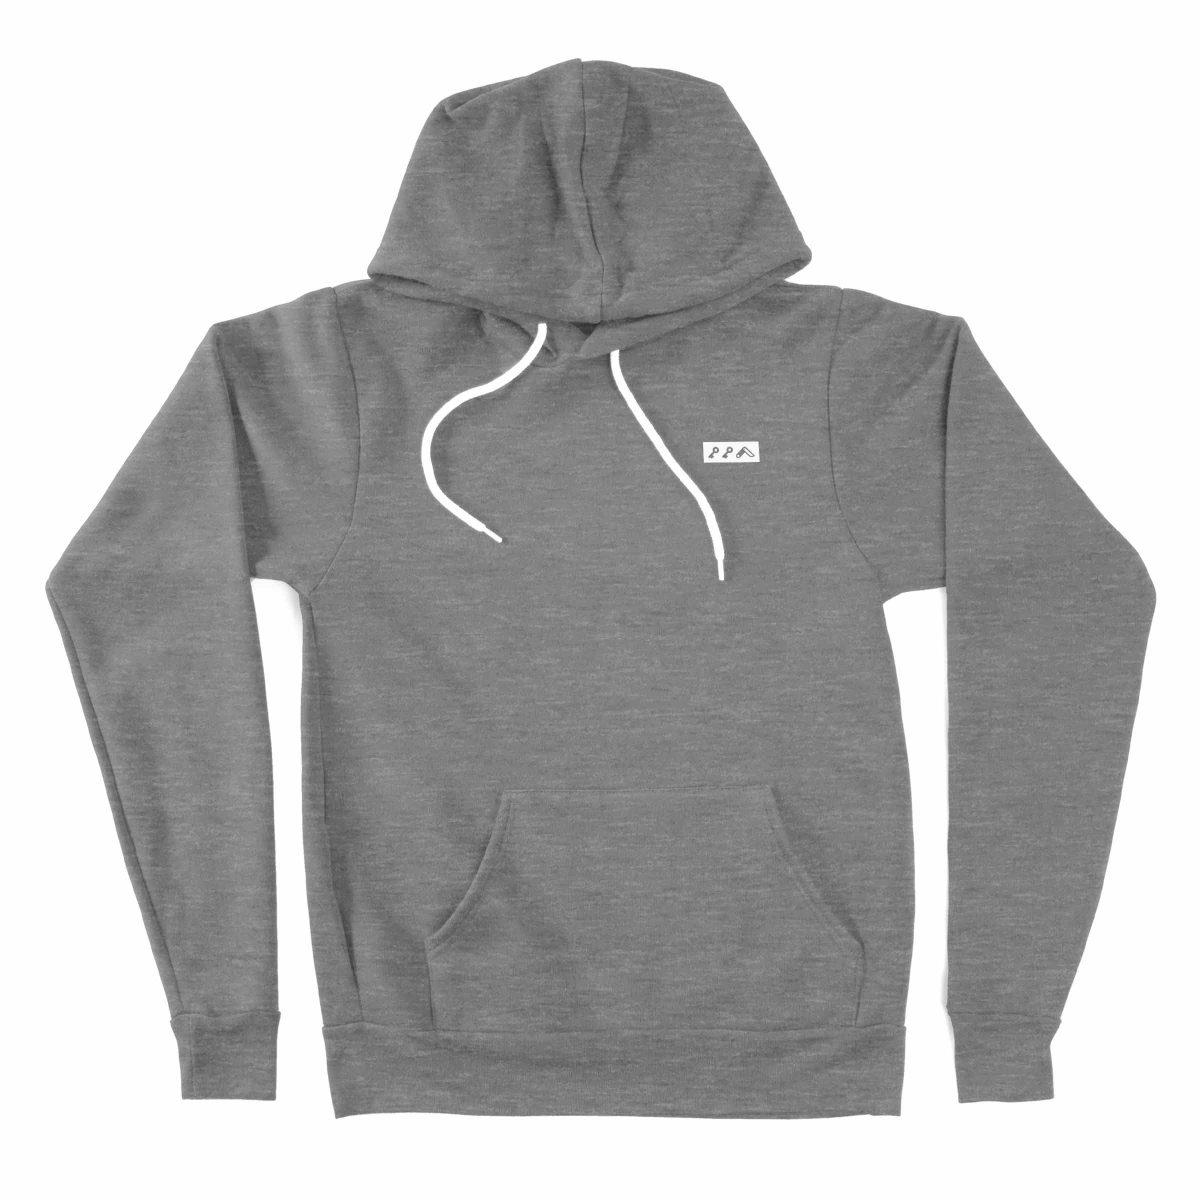 kikicutt icon fleece hoodies by kikicutt sweatshirt store